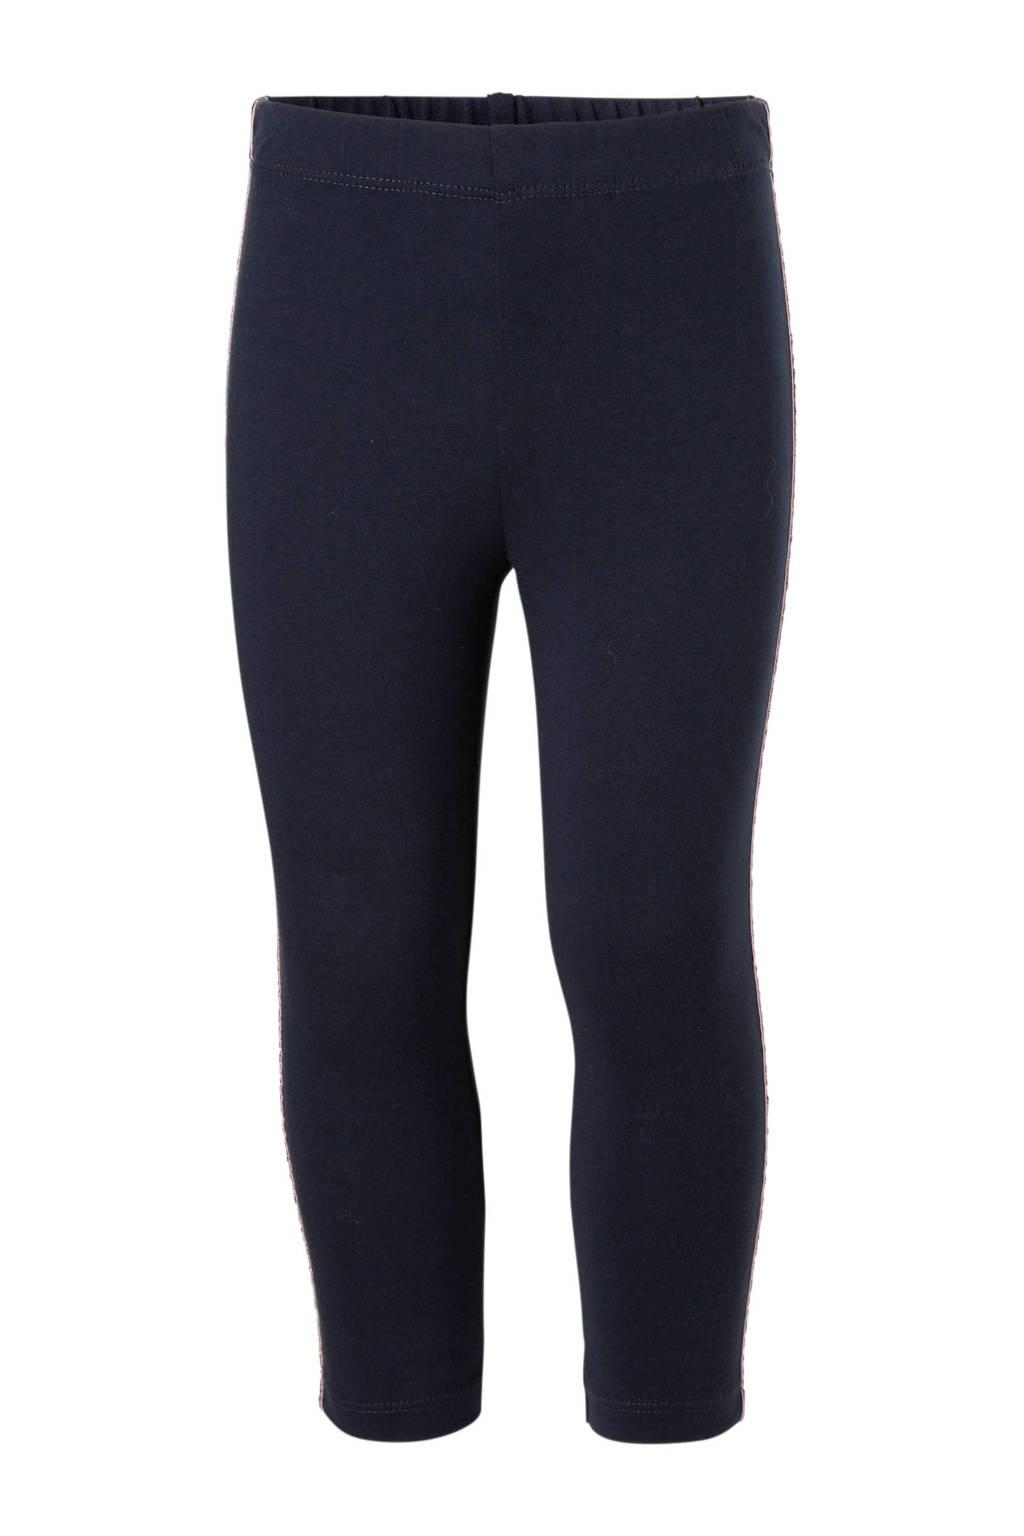 name it MINI legging met zijbies Stri donkerblauw, Donkerblauw/roze